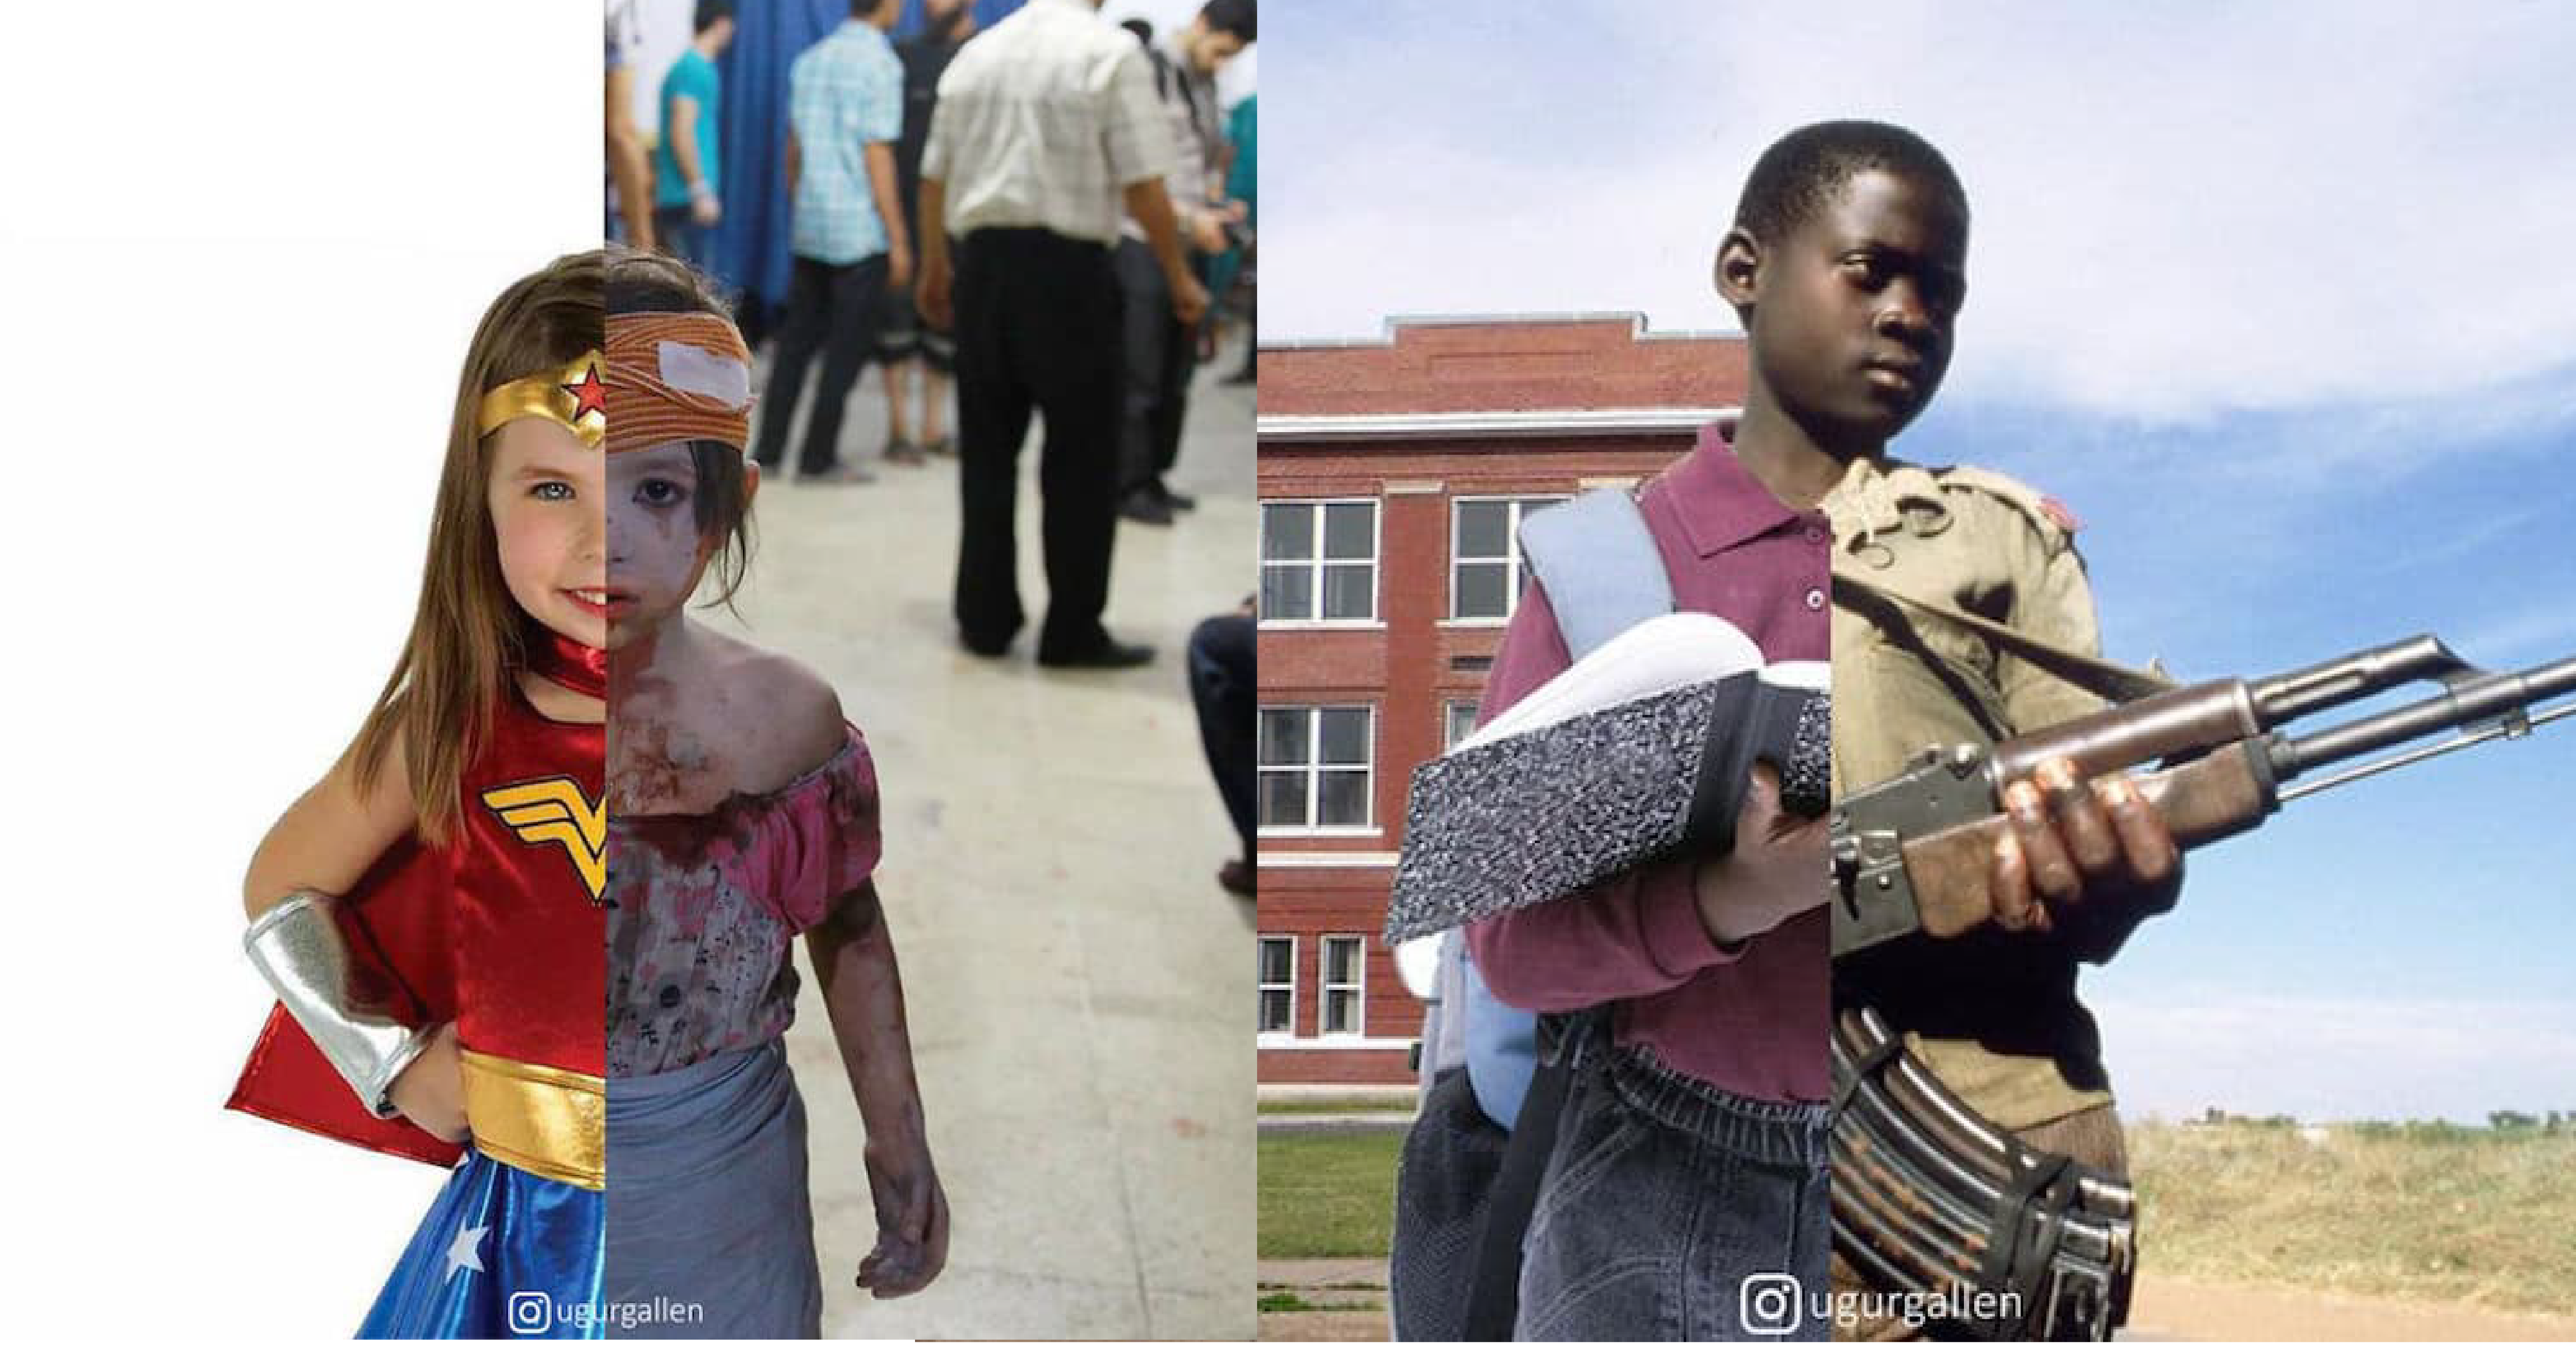 vonvone5b081e99da2 01 11.png - 文明與戰亂的殘酷對比,這組撼人的系列照片讓你反思戰爭的殘酷......